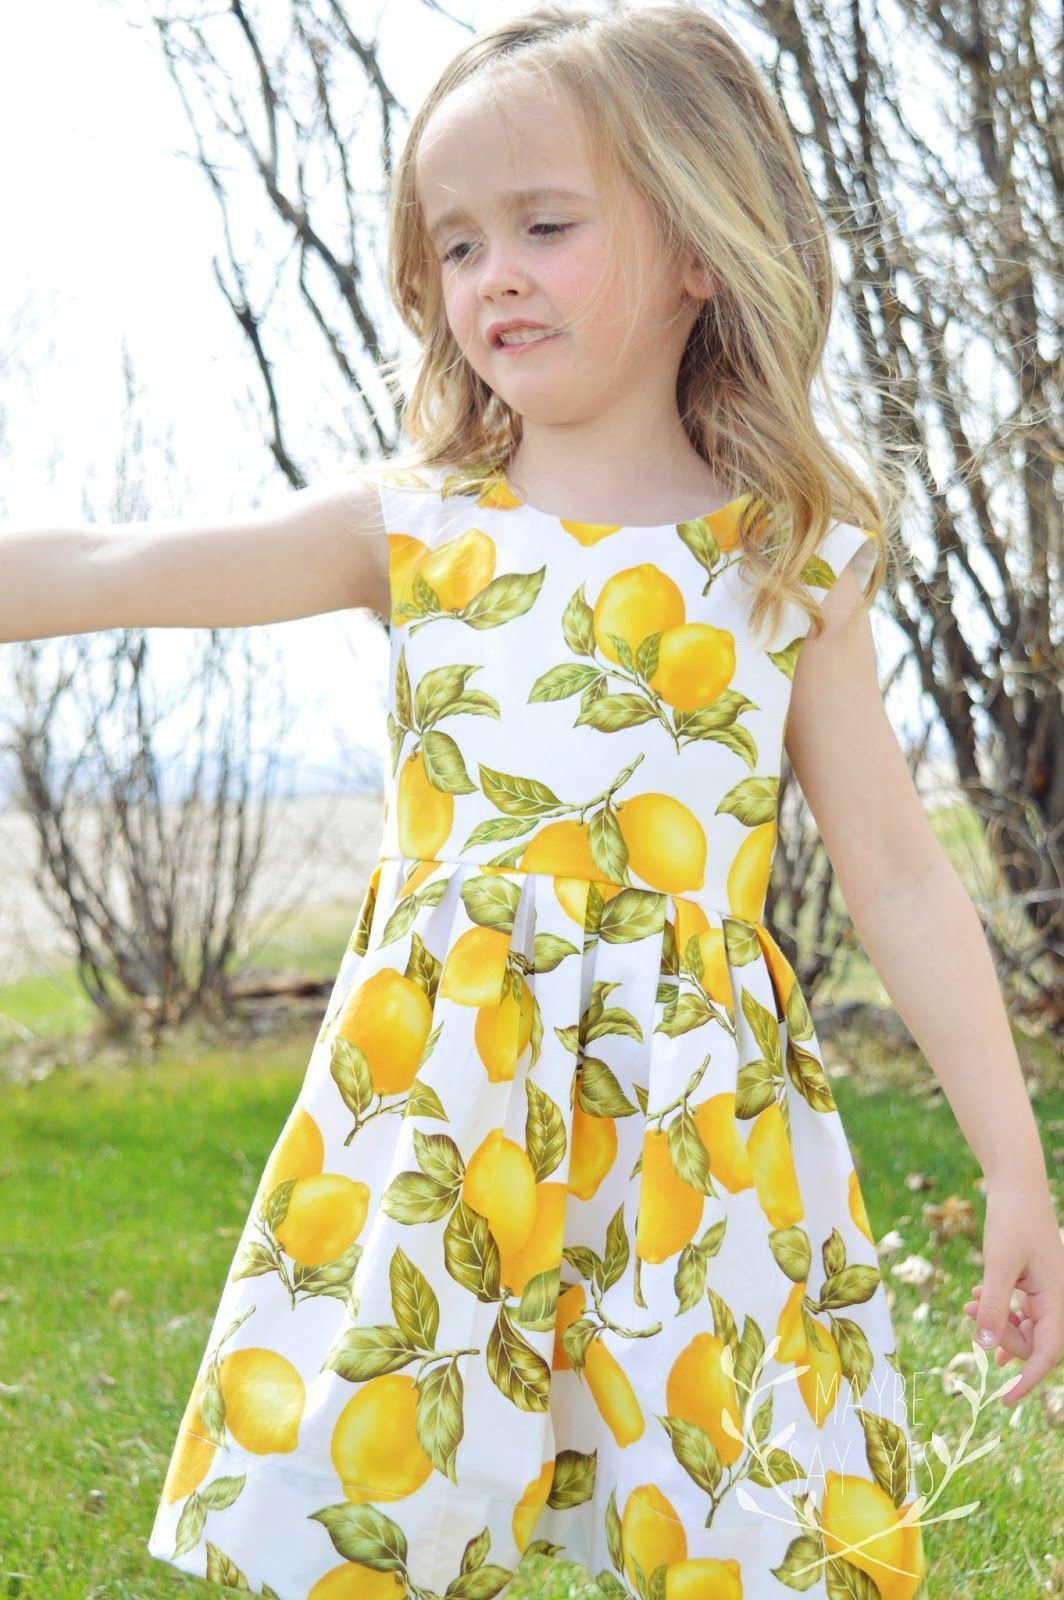 e1adf7c6ba81 Maybe Say Yes: Dolce & Gabbana Lemon Dress Knock-Off | Knock offs ...